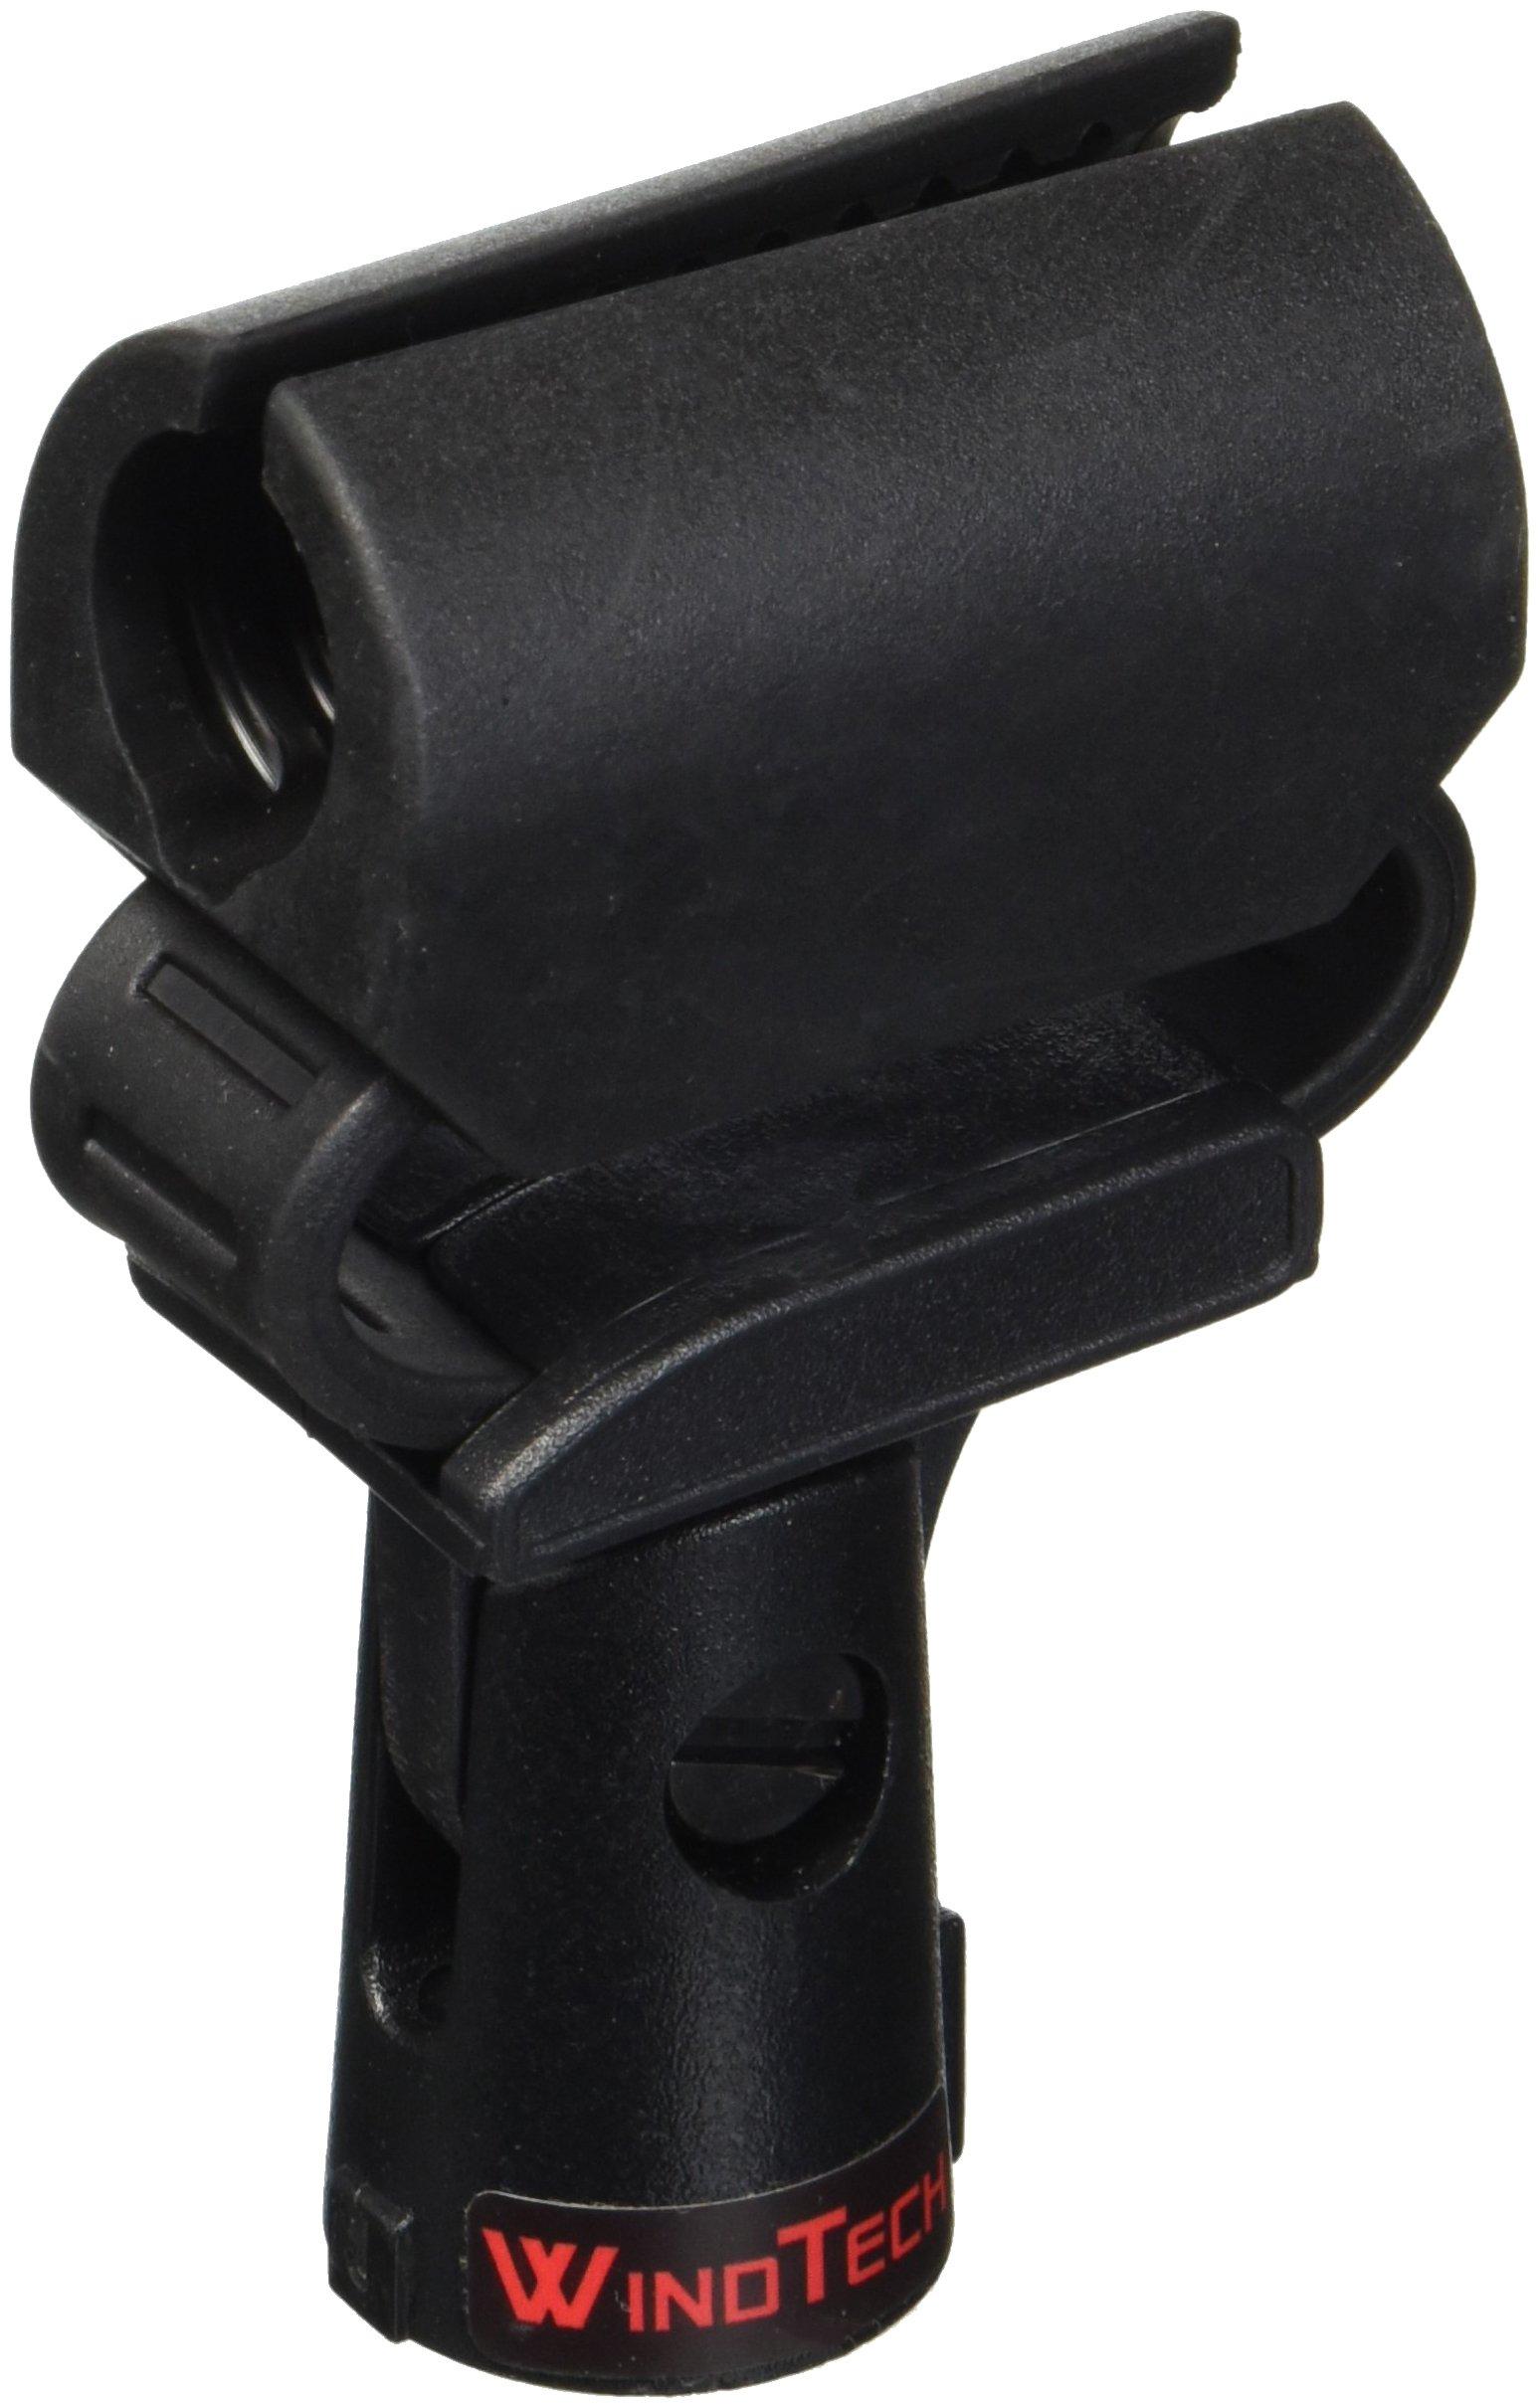 WindTech SP-20 Microphone Shock Mount